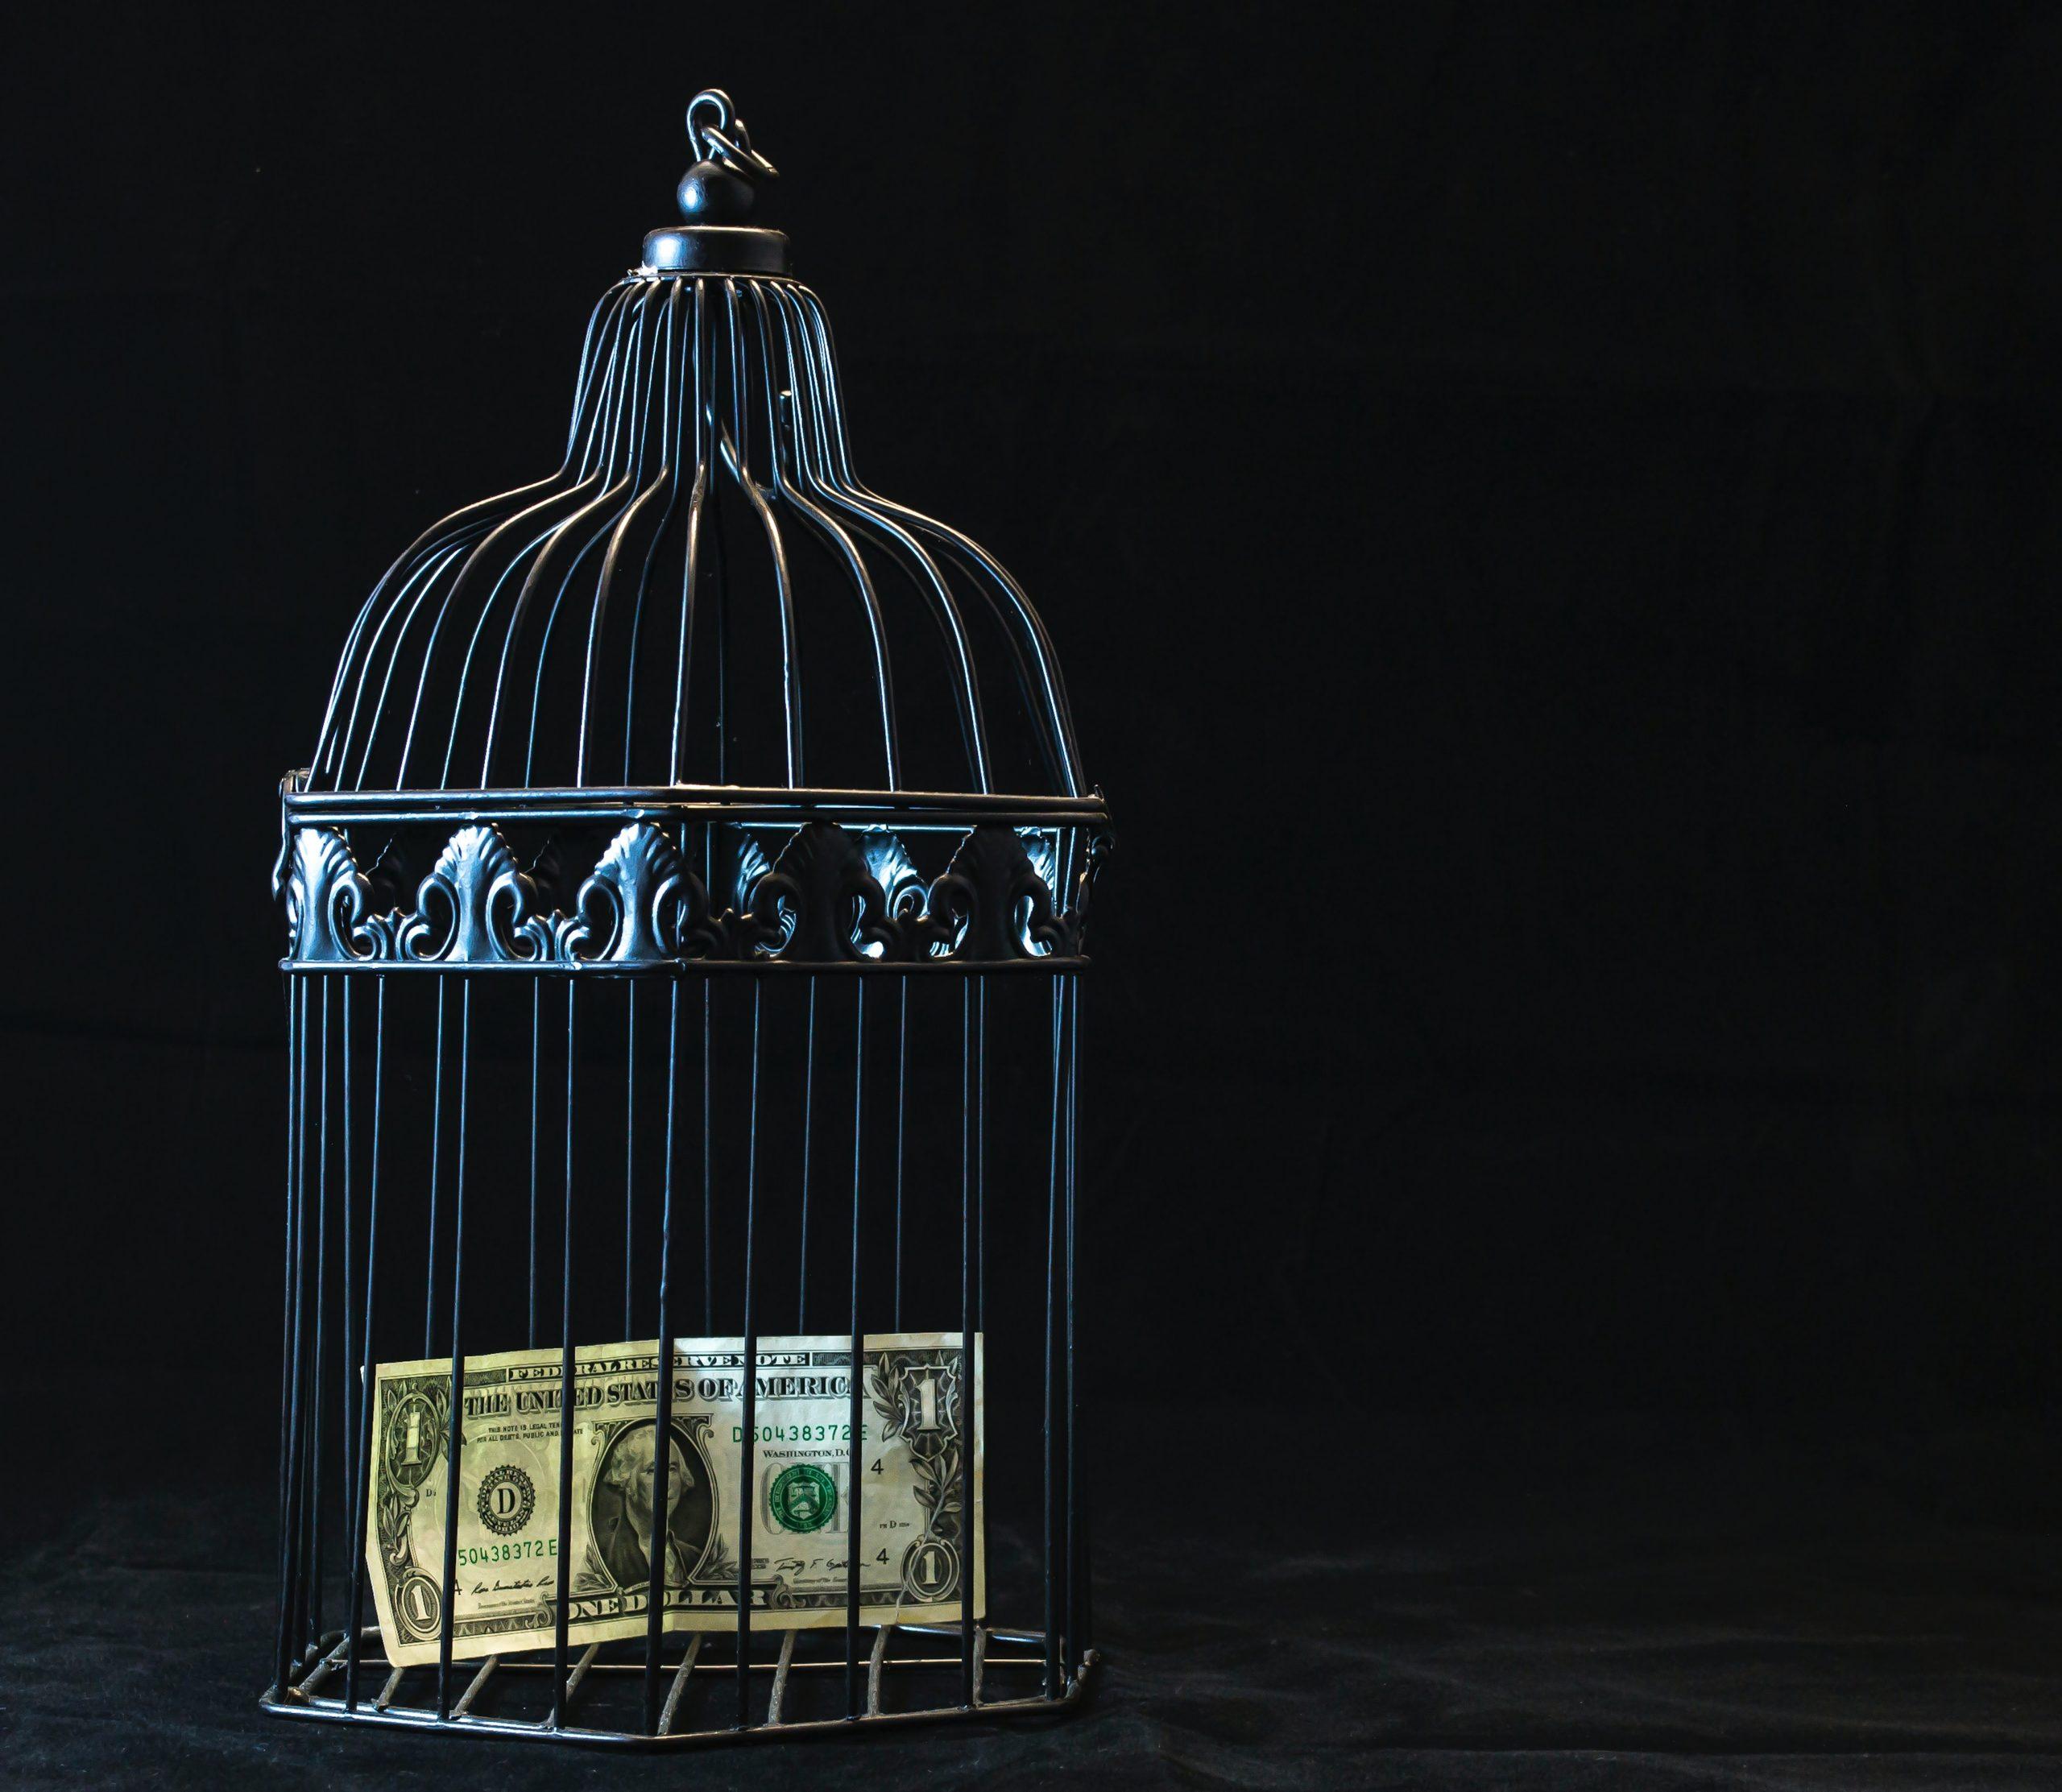 Financial infidelity money stories